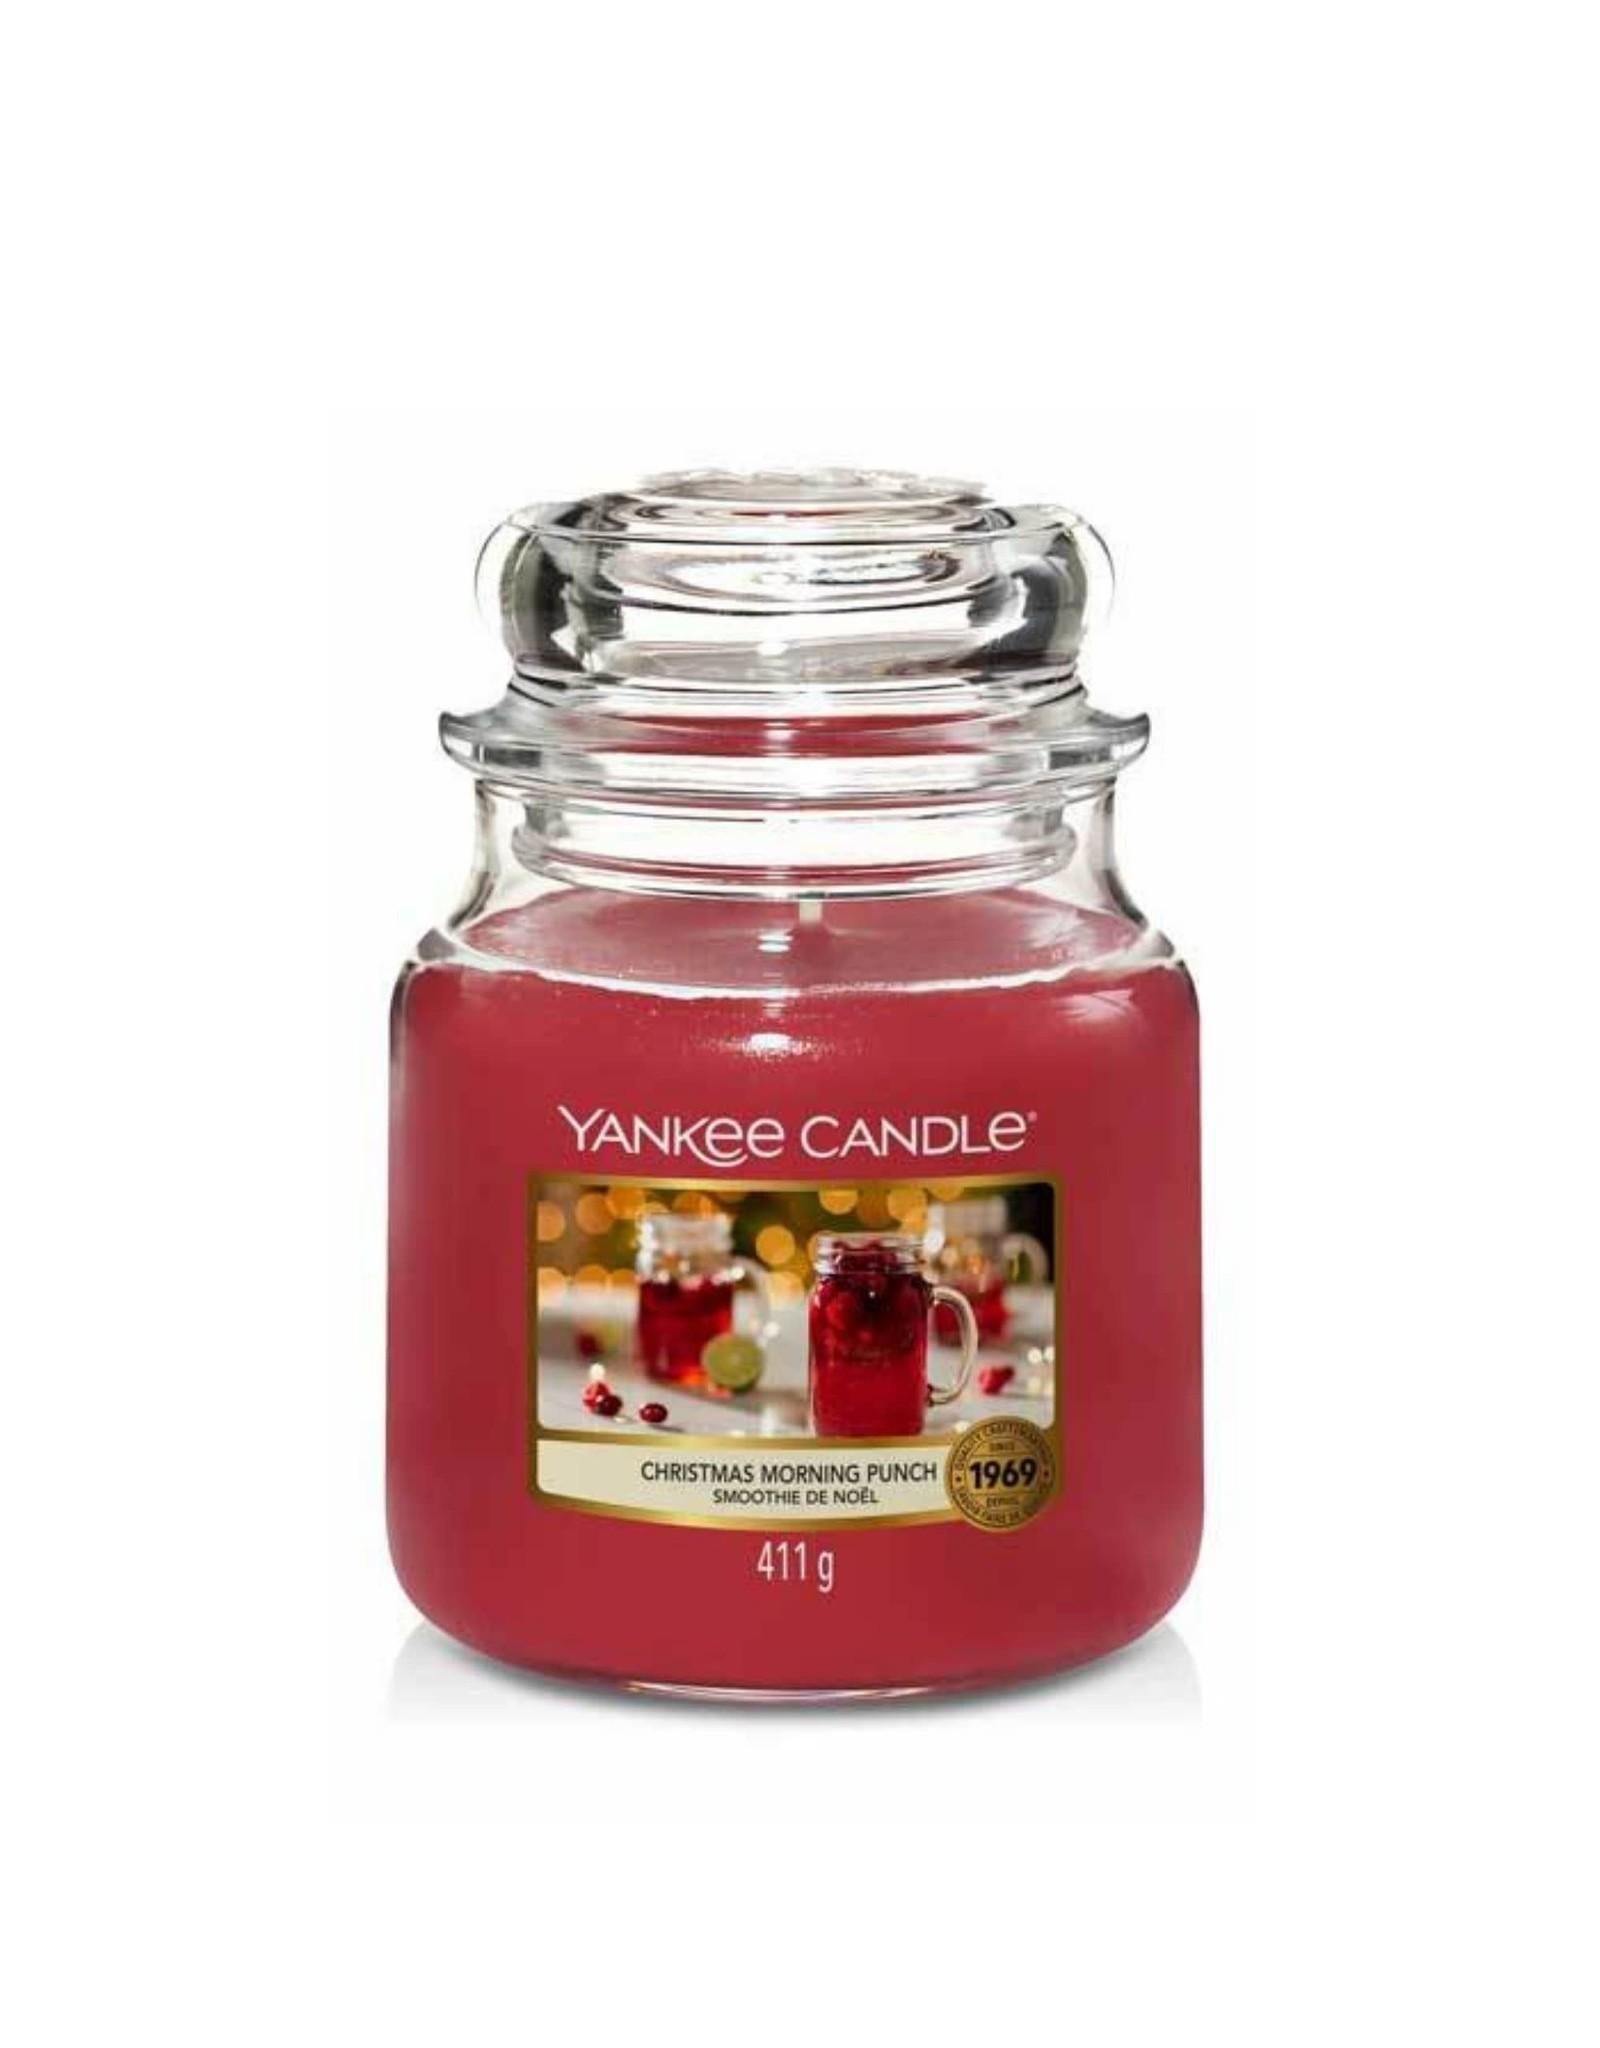 Yankee Candle Christmas Morning Punch - Medium Jar